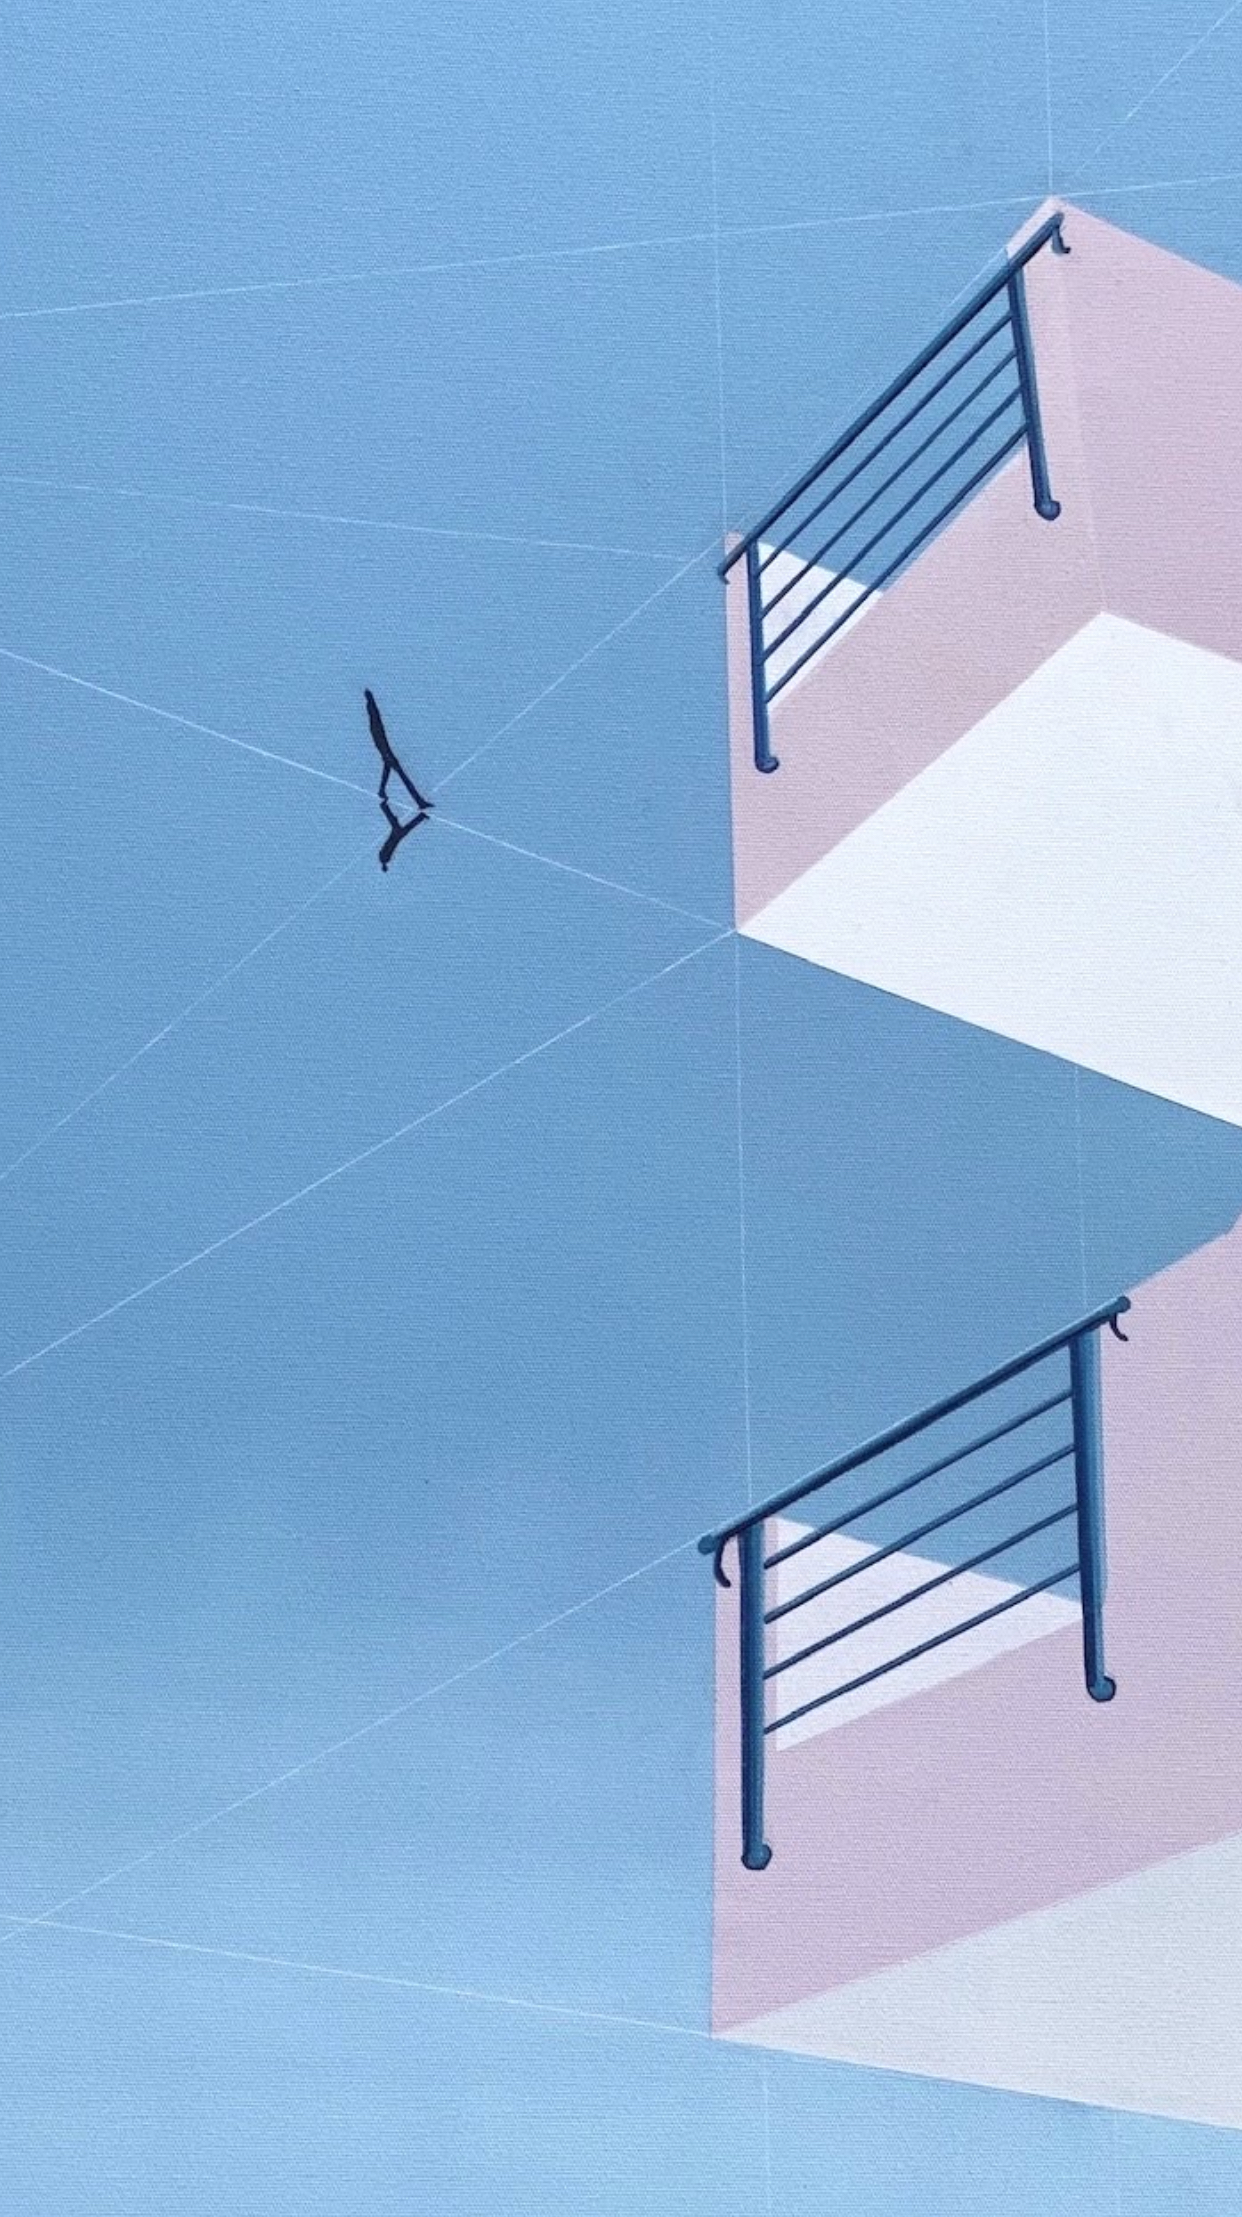 NEVINE HAMZA 'FREE TRANSFORM'-2020 - ORIGINAL 1/1 - Image 6 of 6